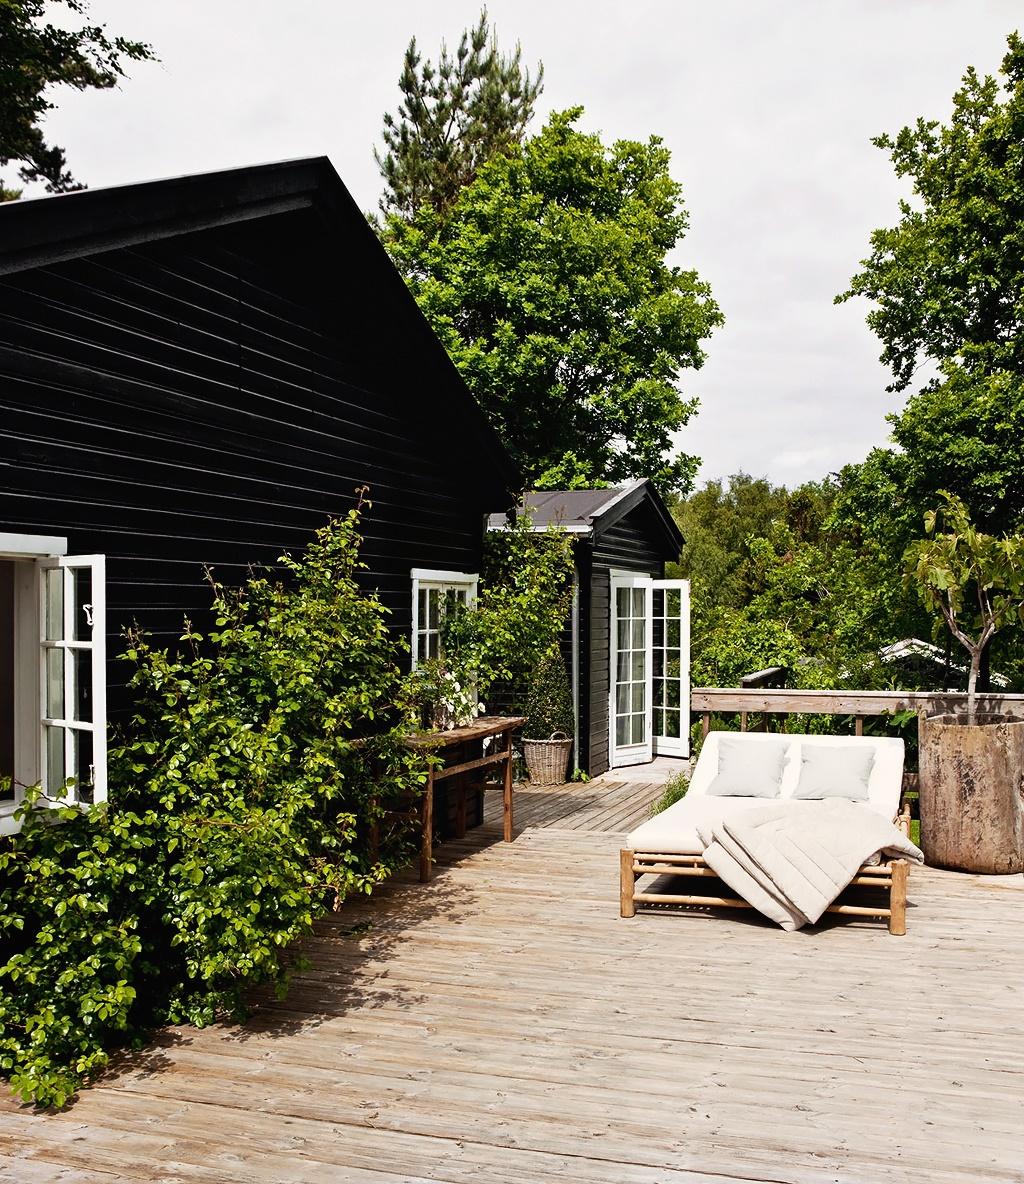 Casa de Verano Escandinava Cama Exterior